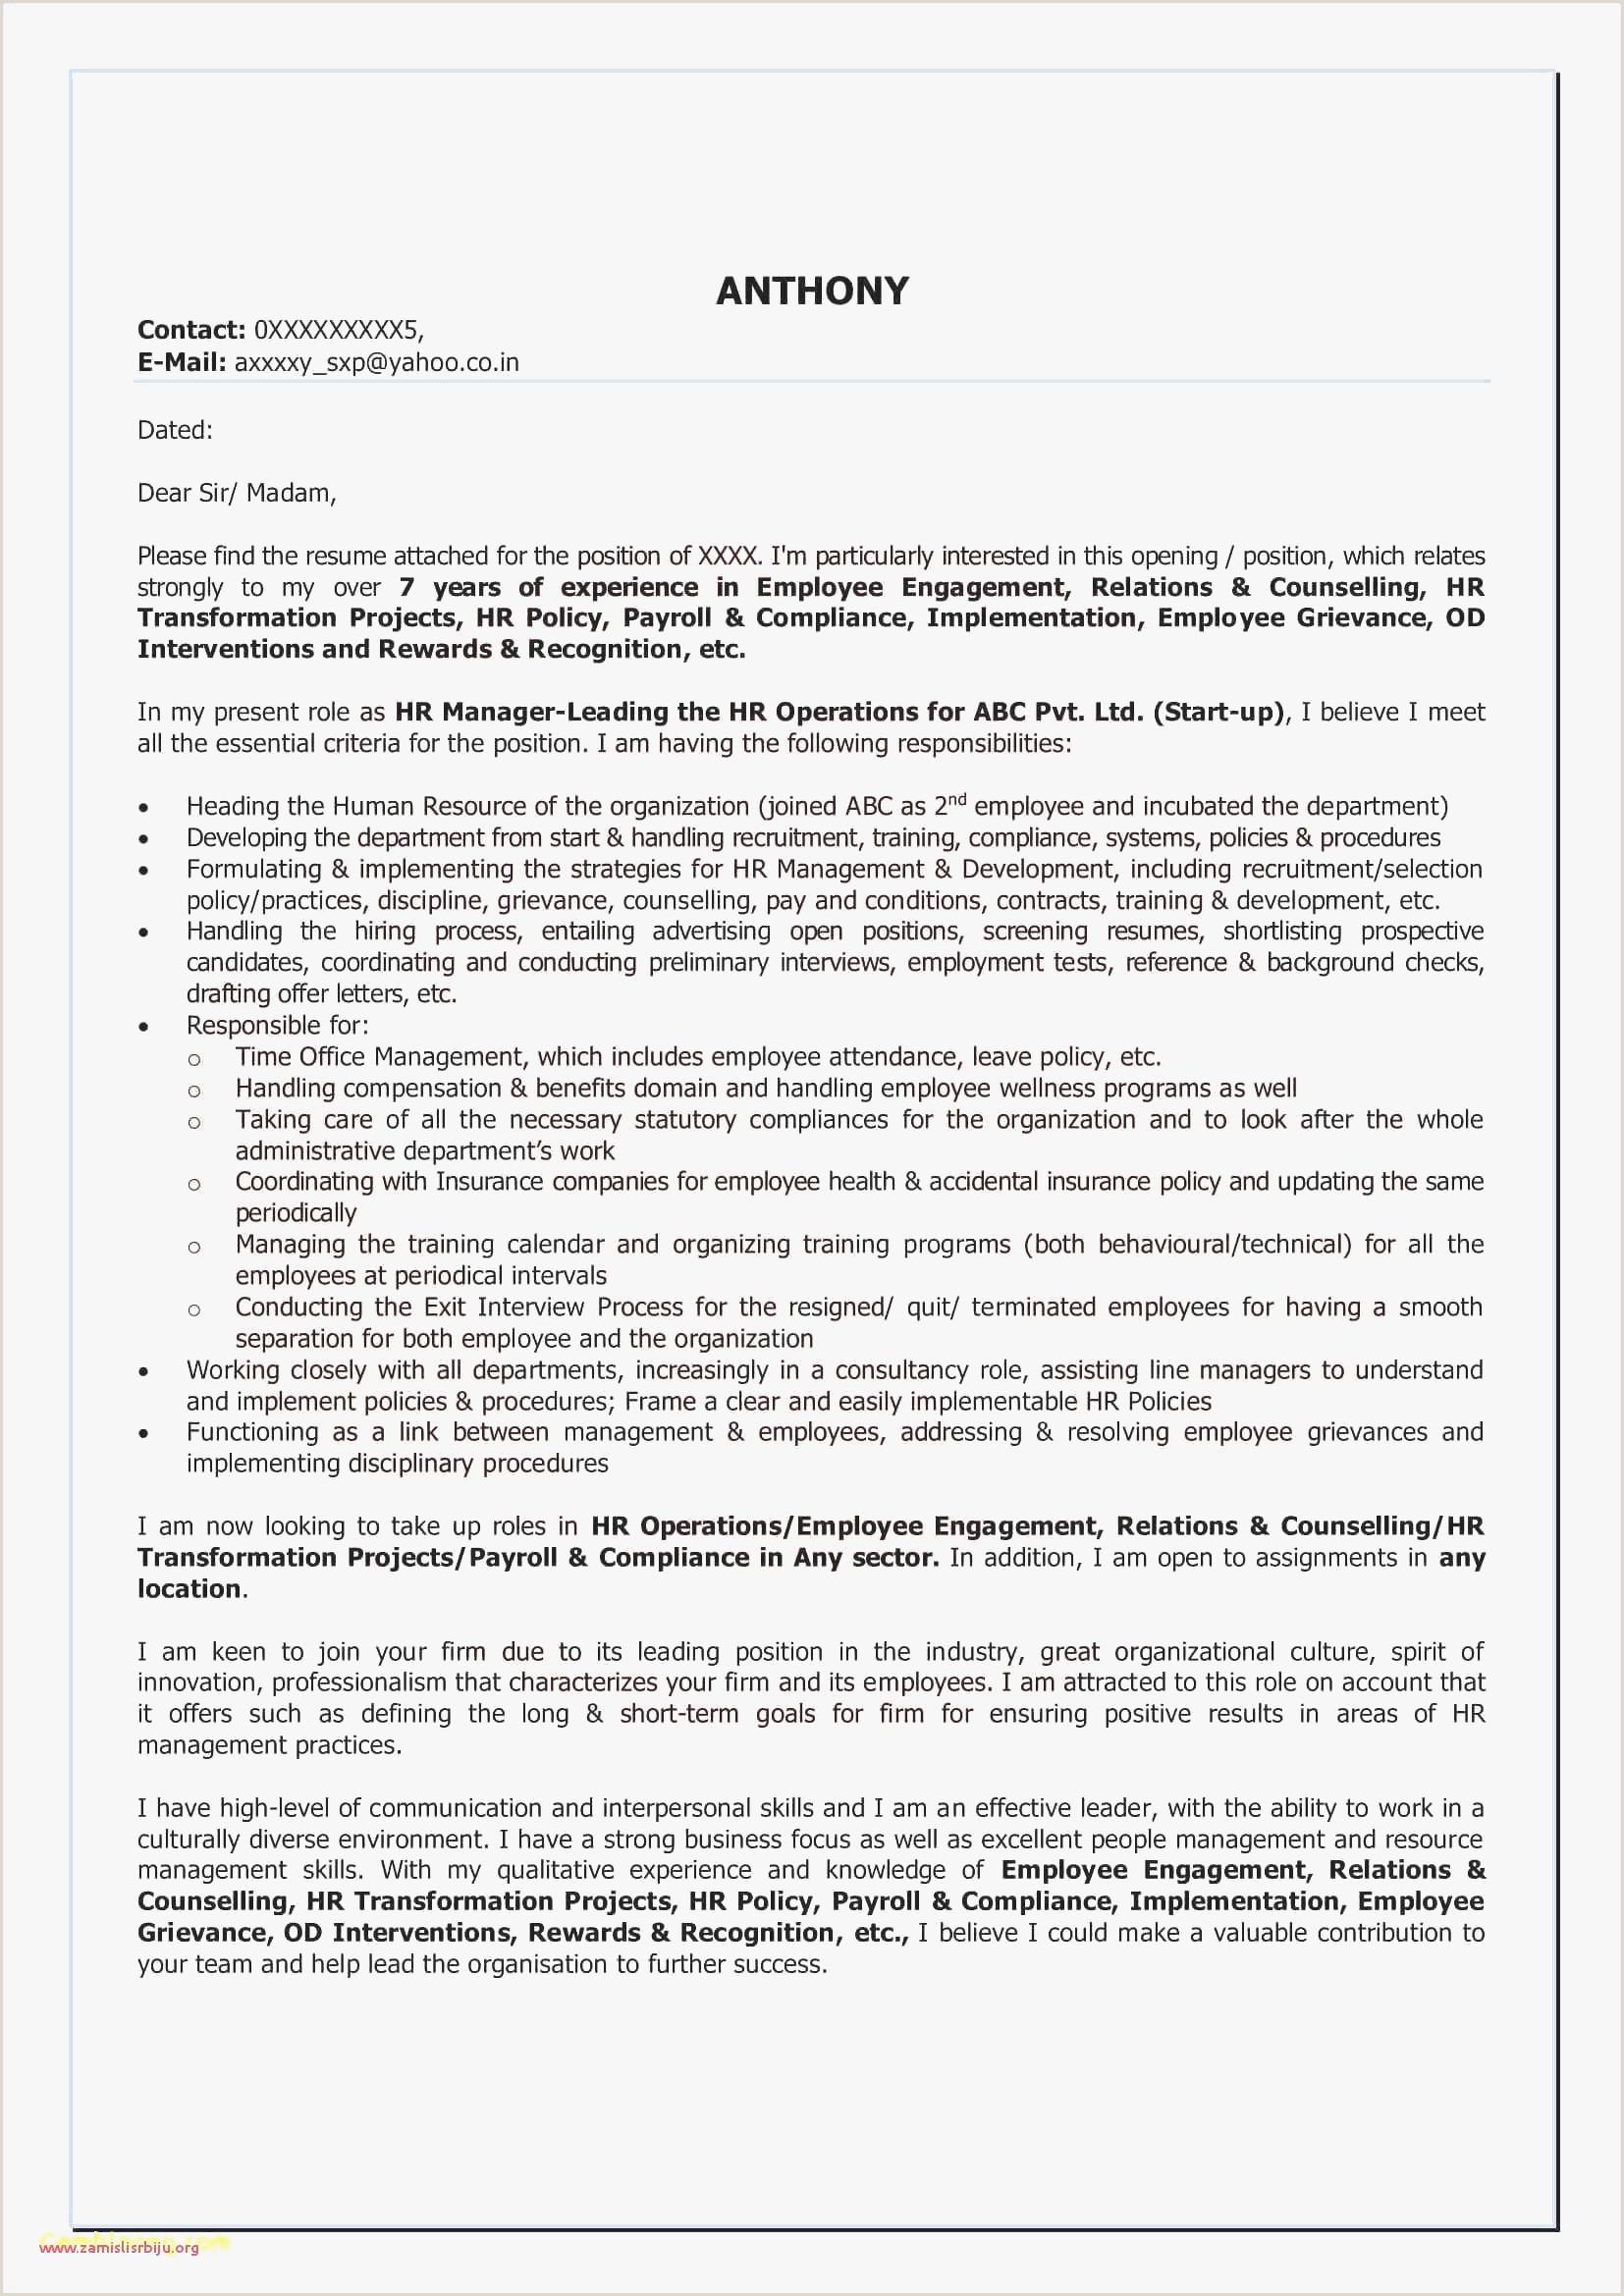 Pharmacist Letter Ce with Cover Letter Sample for Job